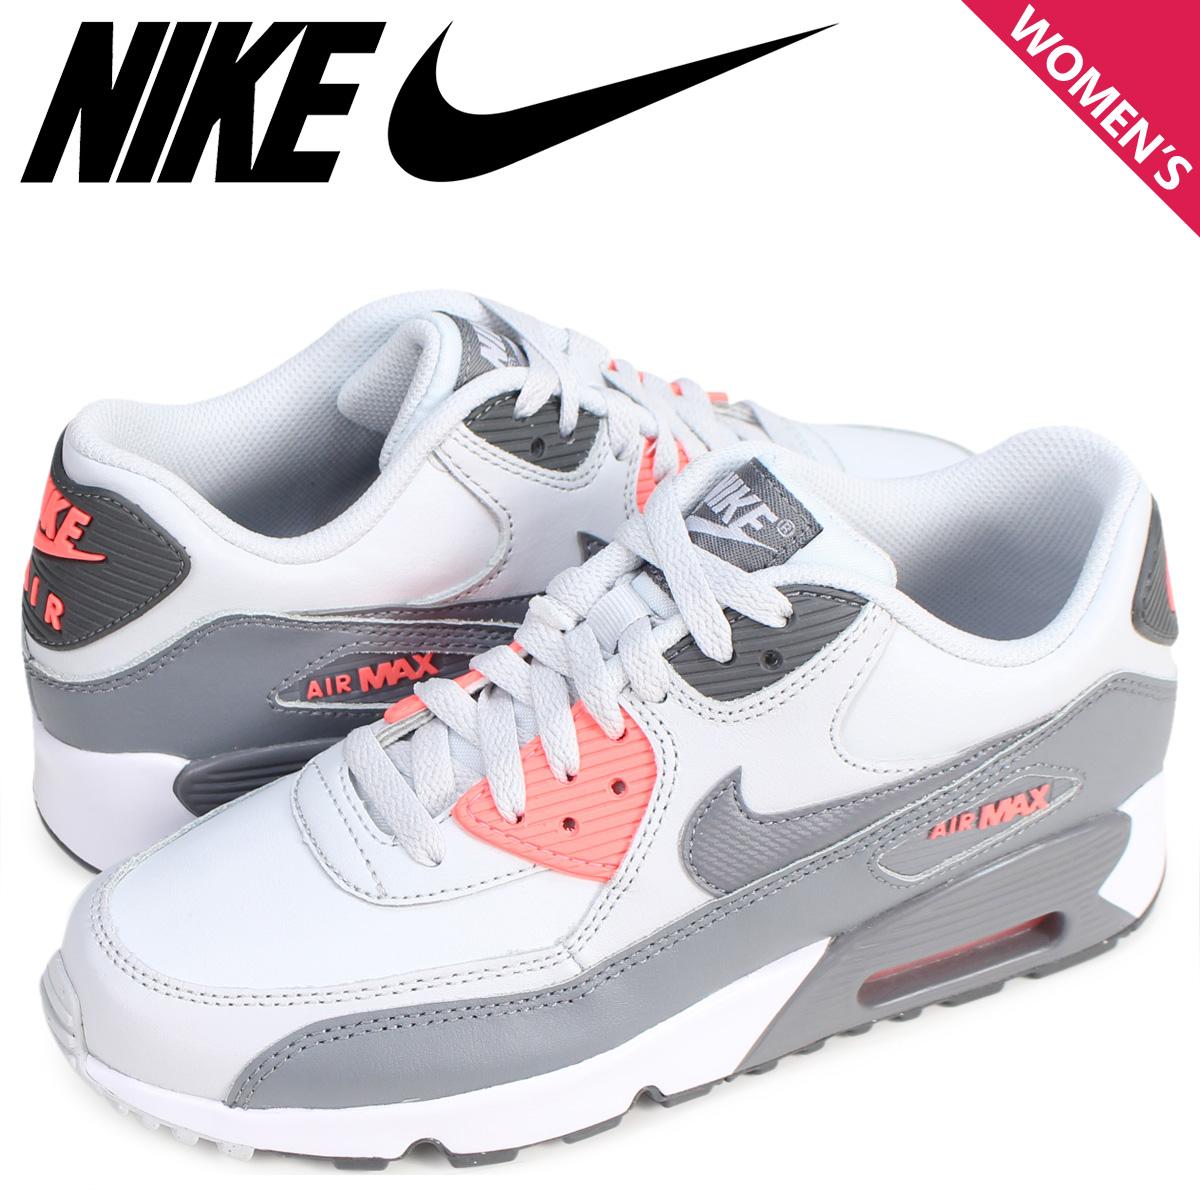 sale retailer 9192b 4397c ... promo code for nike nike air max 90 ladys sneakers air max 90 ltr gs  833376